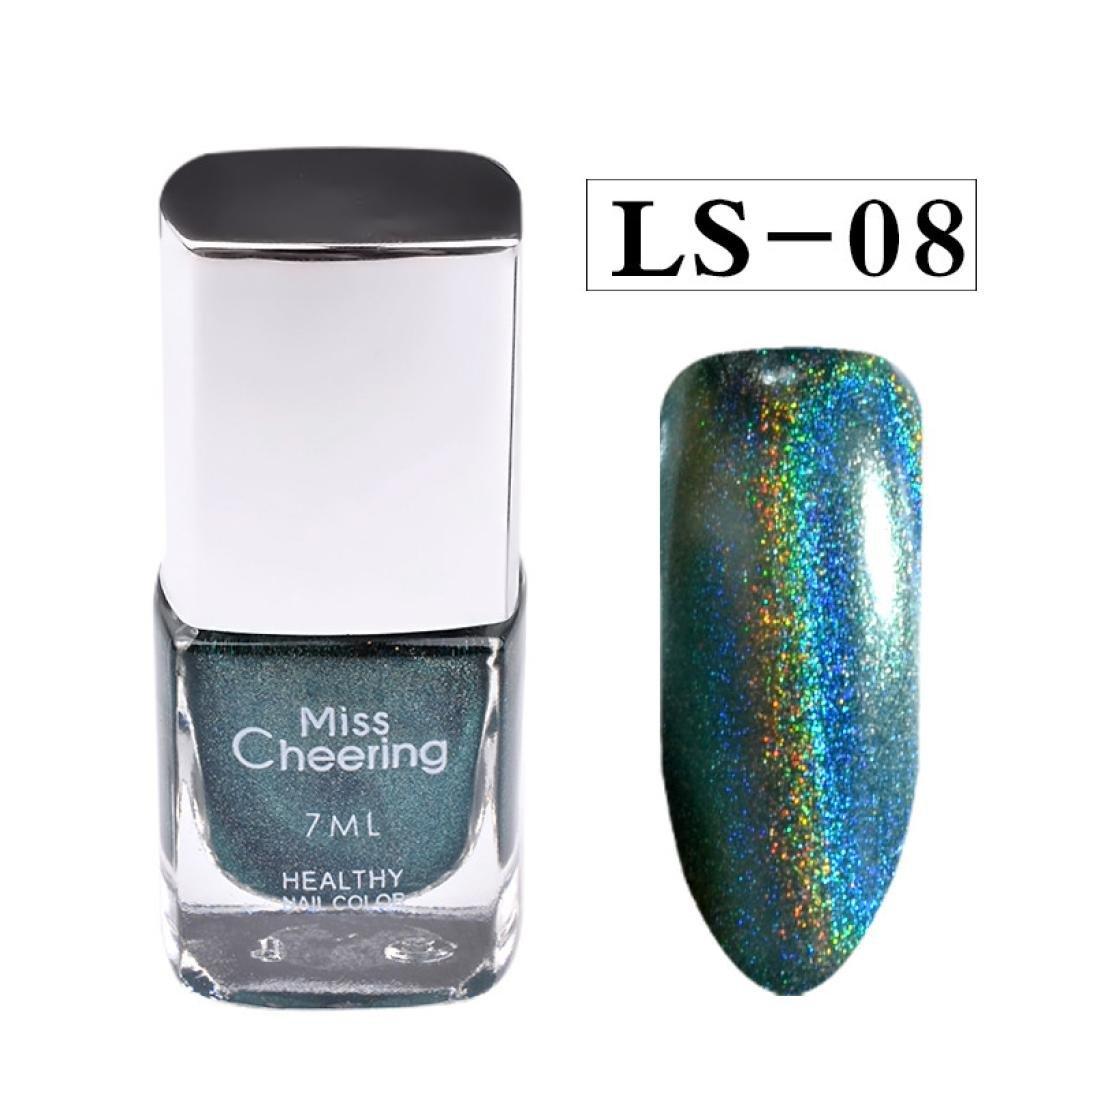 Samlike, 7ml nail polish pretty Holographic Nail Polish Holo GLITTER GEL POLISH NAIL ART Holographic (H)